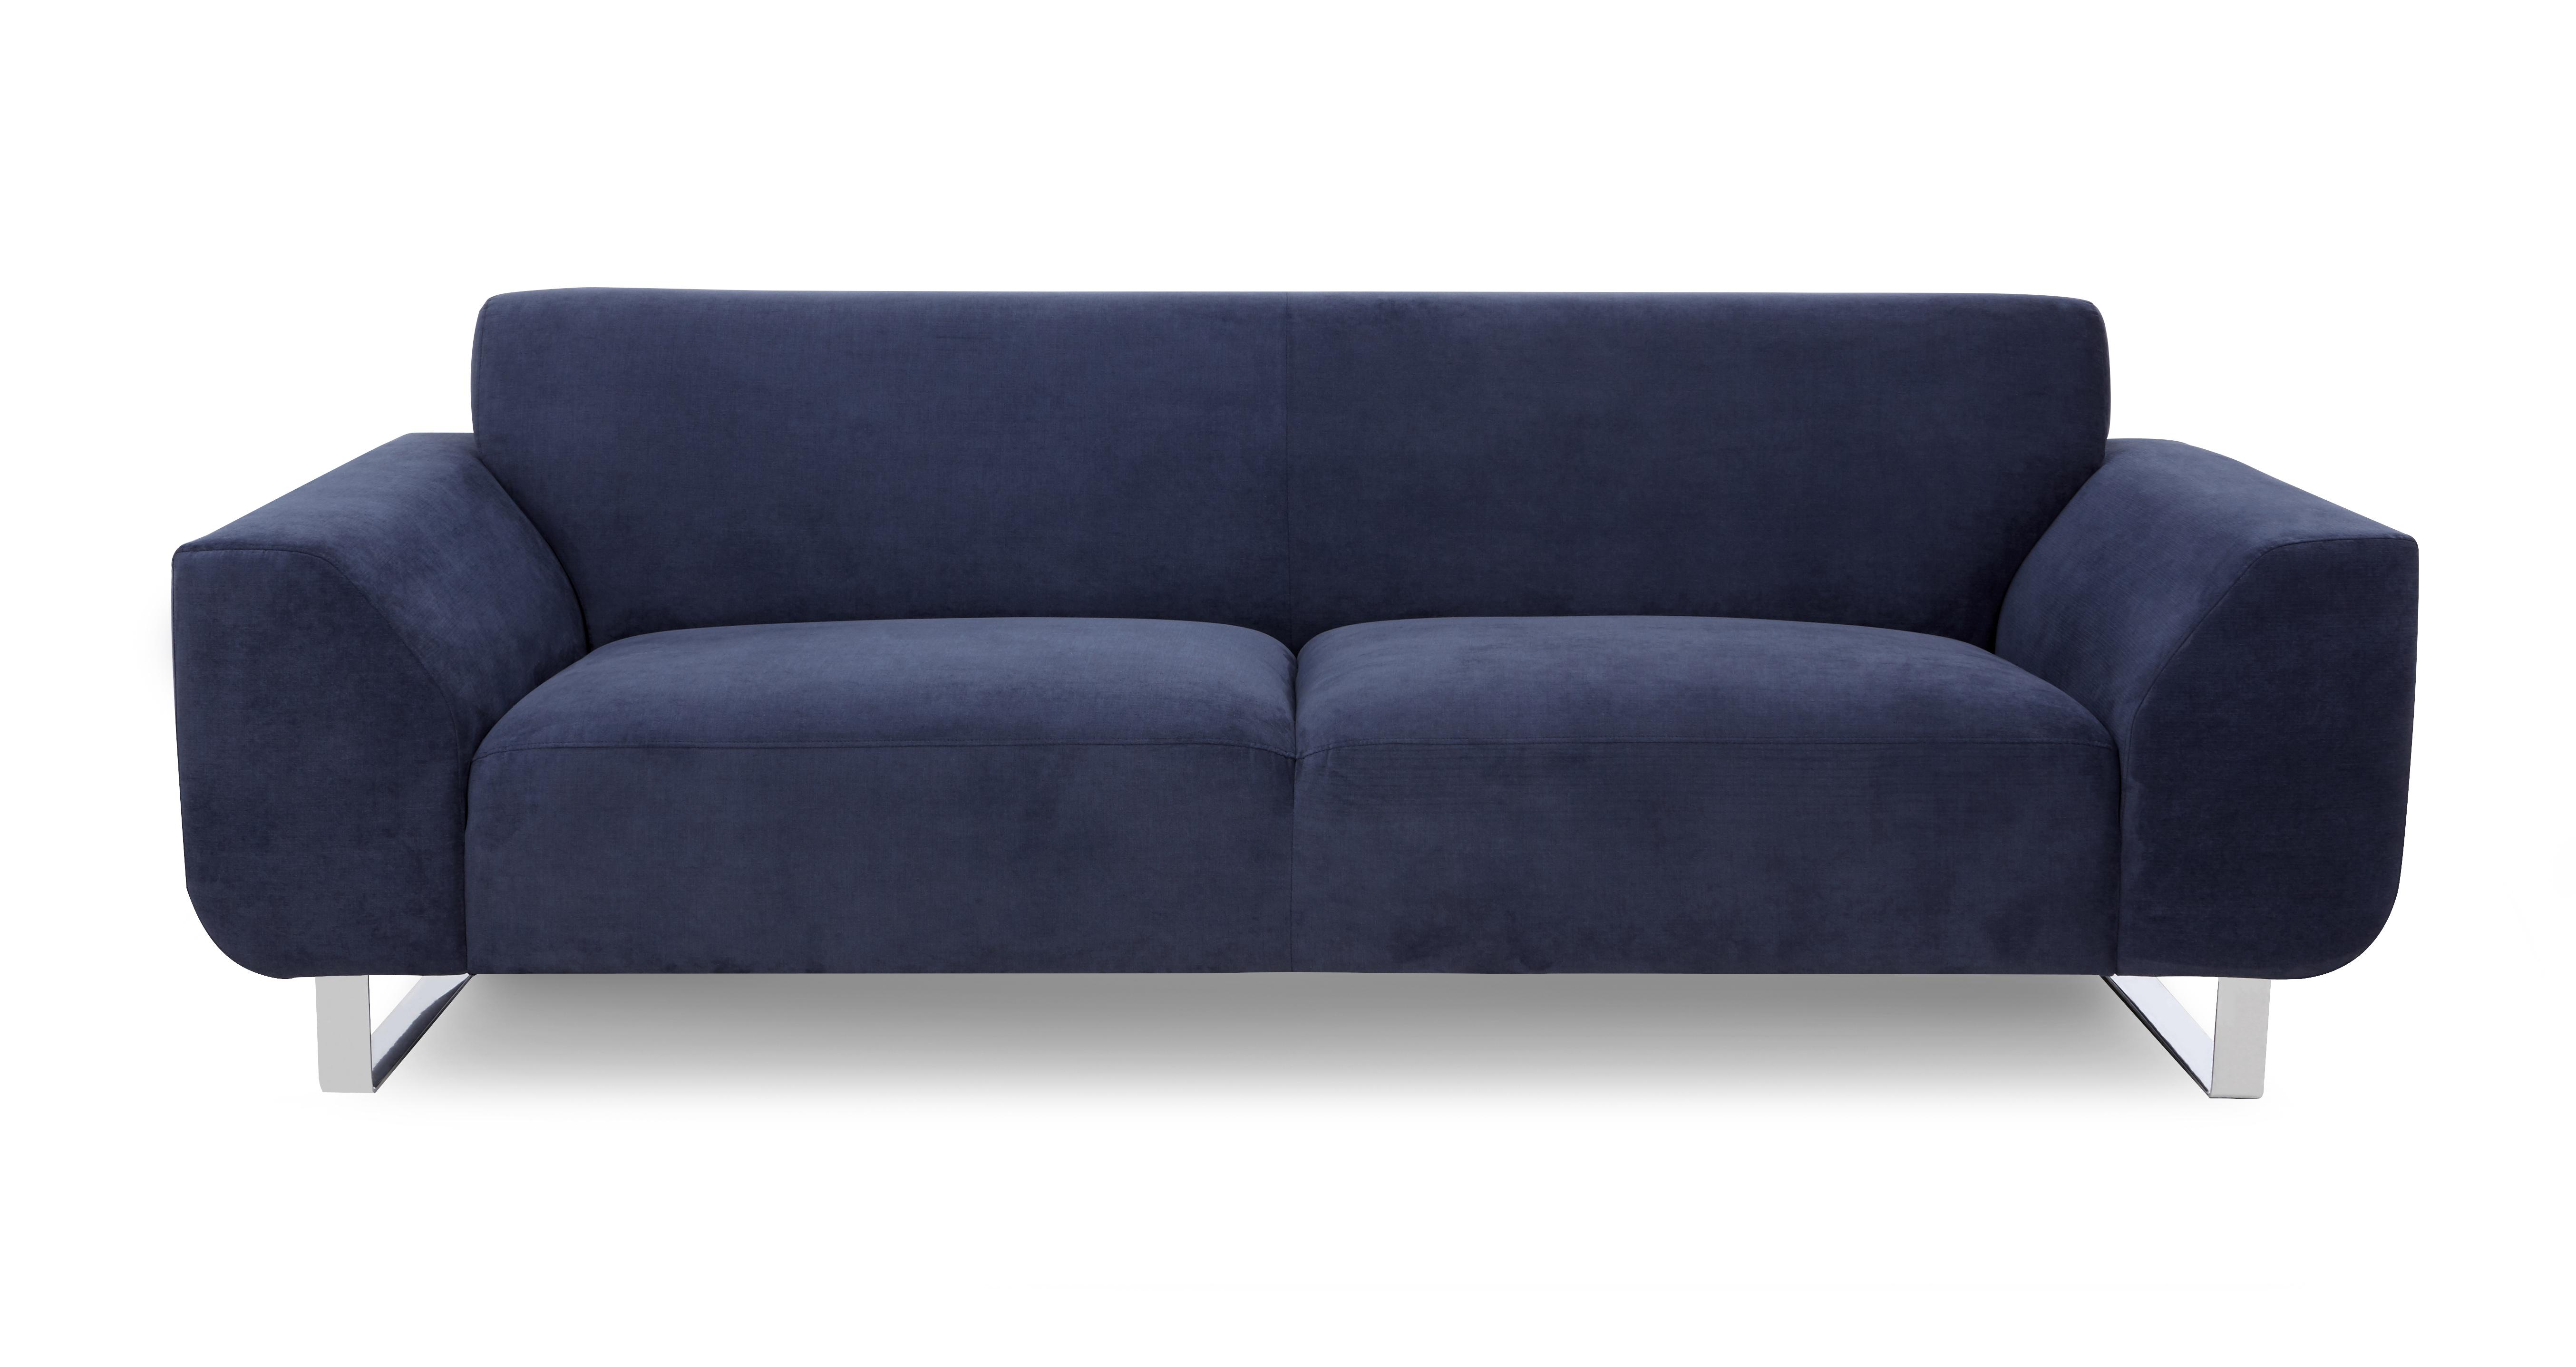 Hardy 3 Seater Sofa Plaza Dfs Ireland